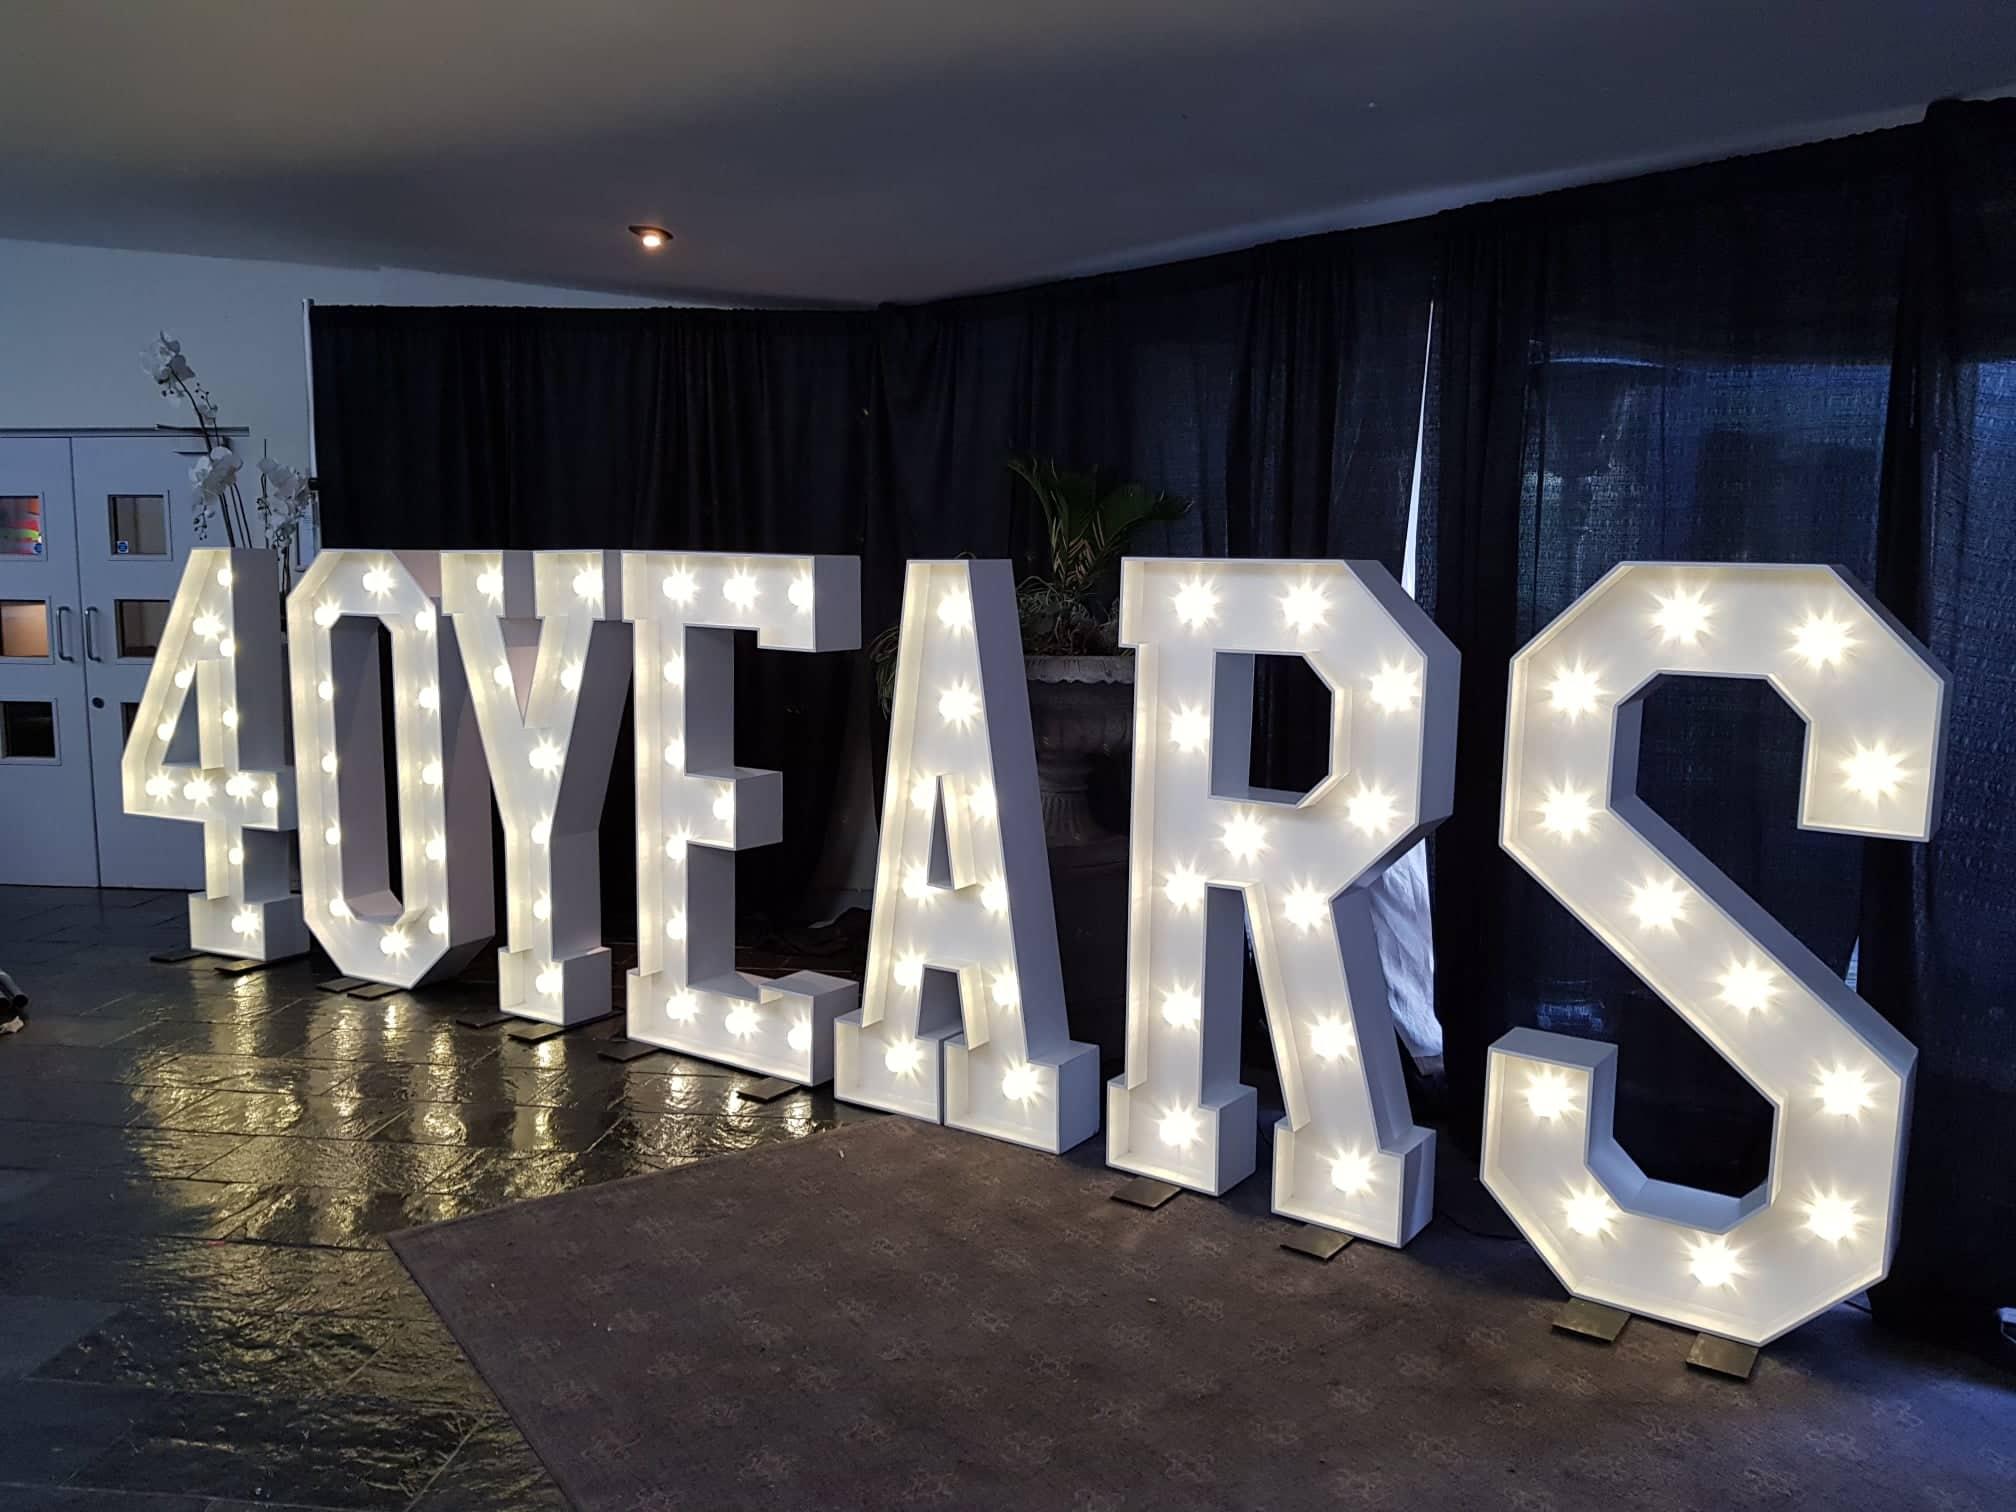 40 years centra gsk company milestone anniversary